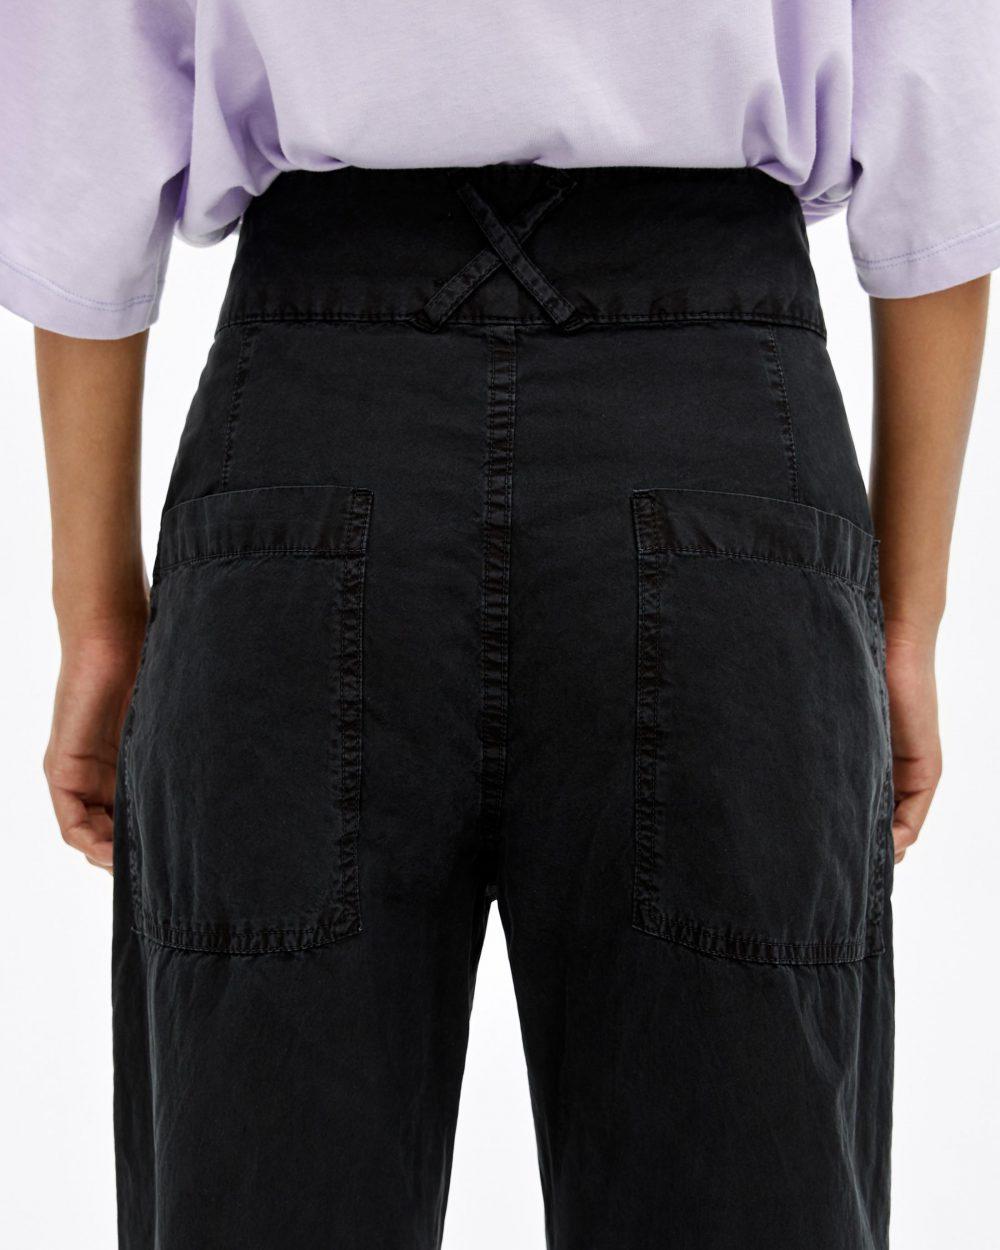 Pantaloni Carota Neri Nero Donna | Pantaloni Bimba Y Lola